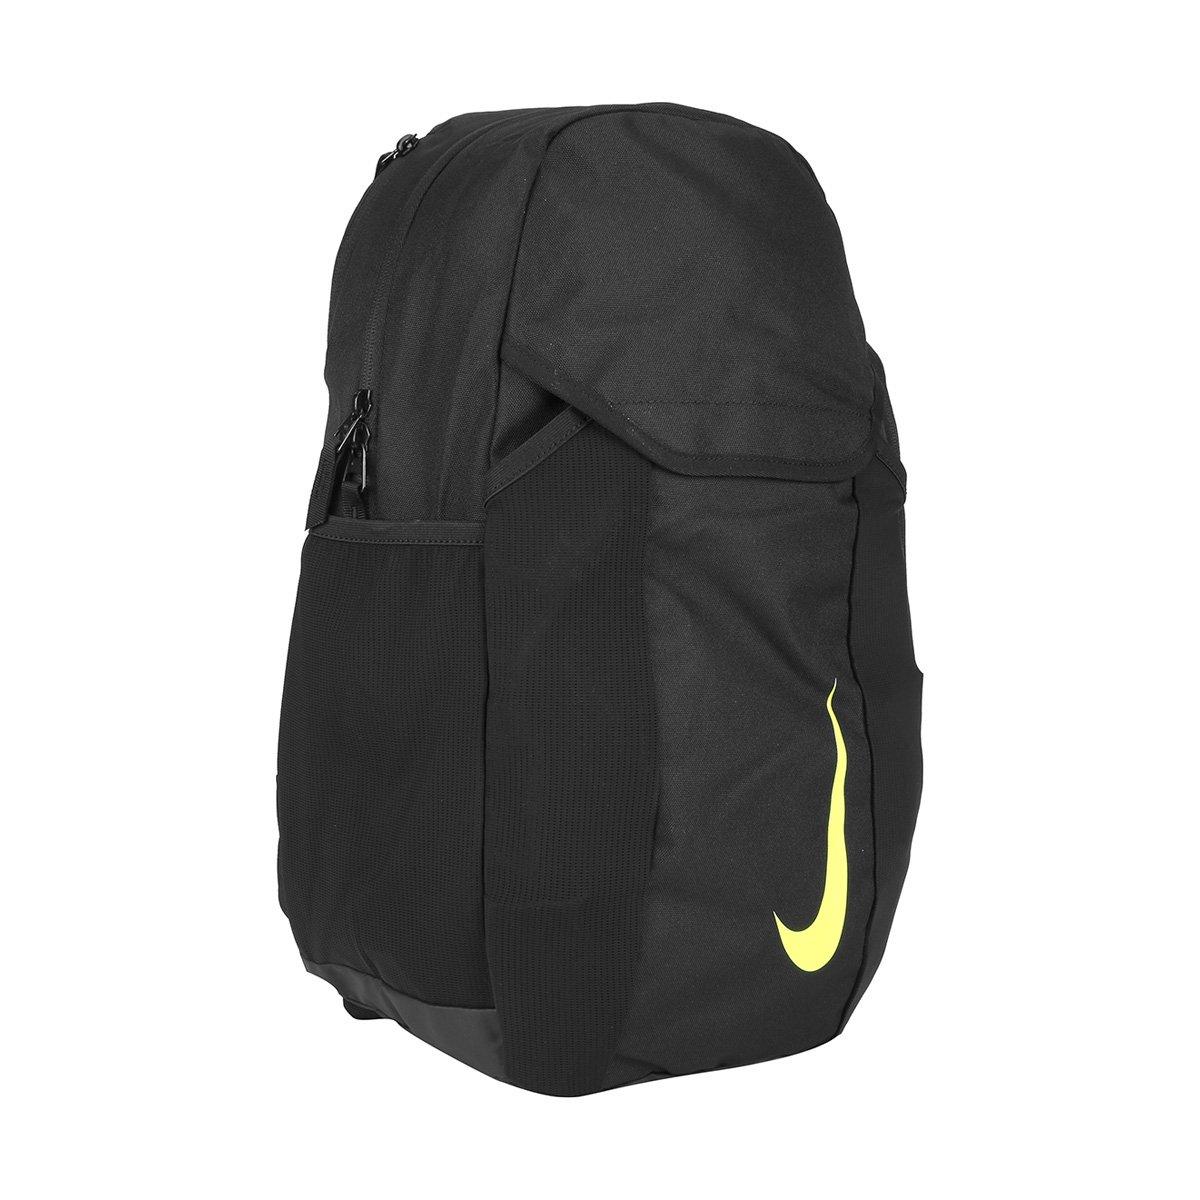 Mochila Nike Academy 2.0 - Preto - Compre Agora  b0286118afbb5